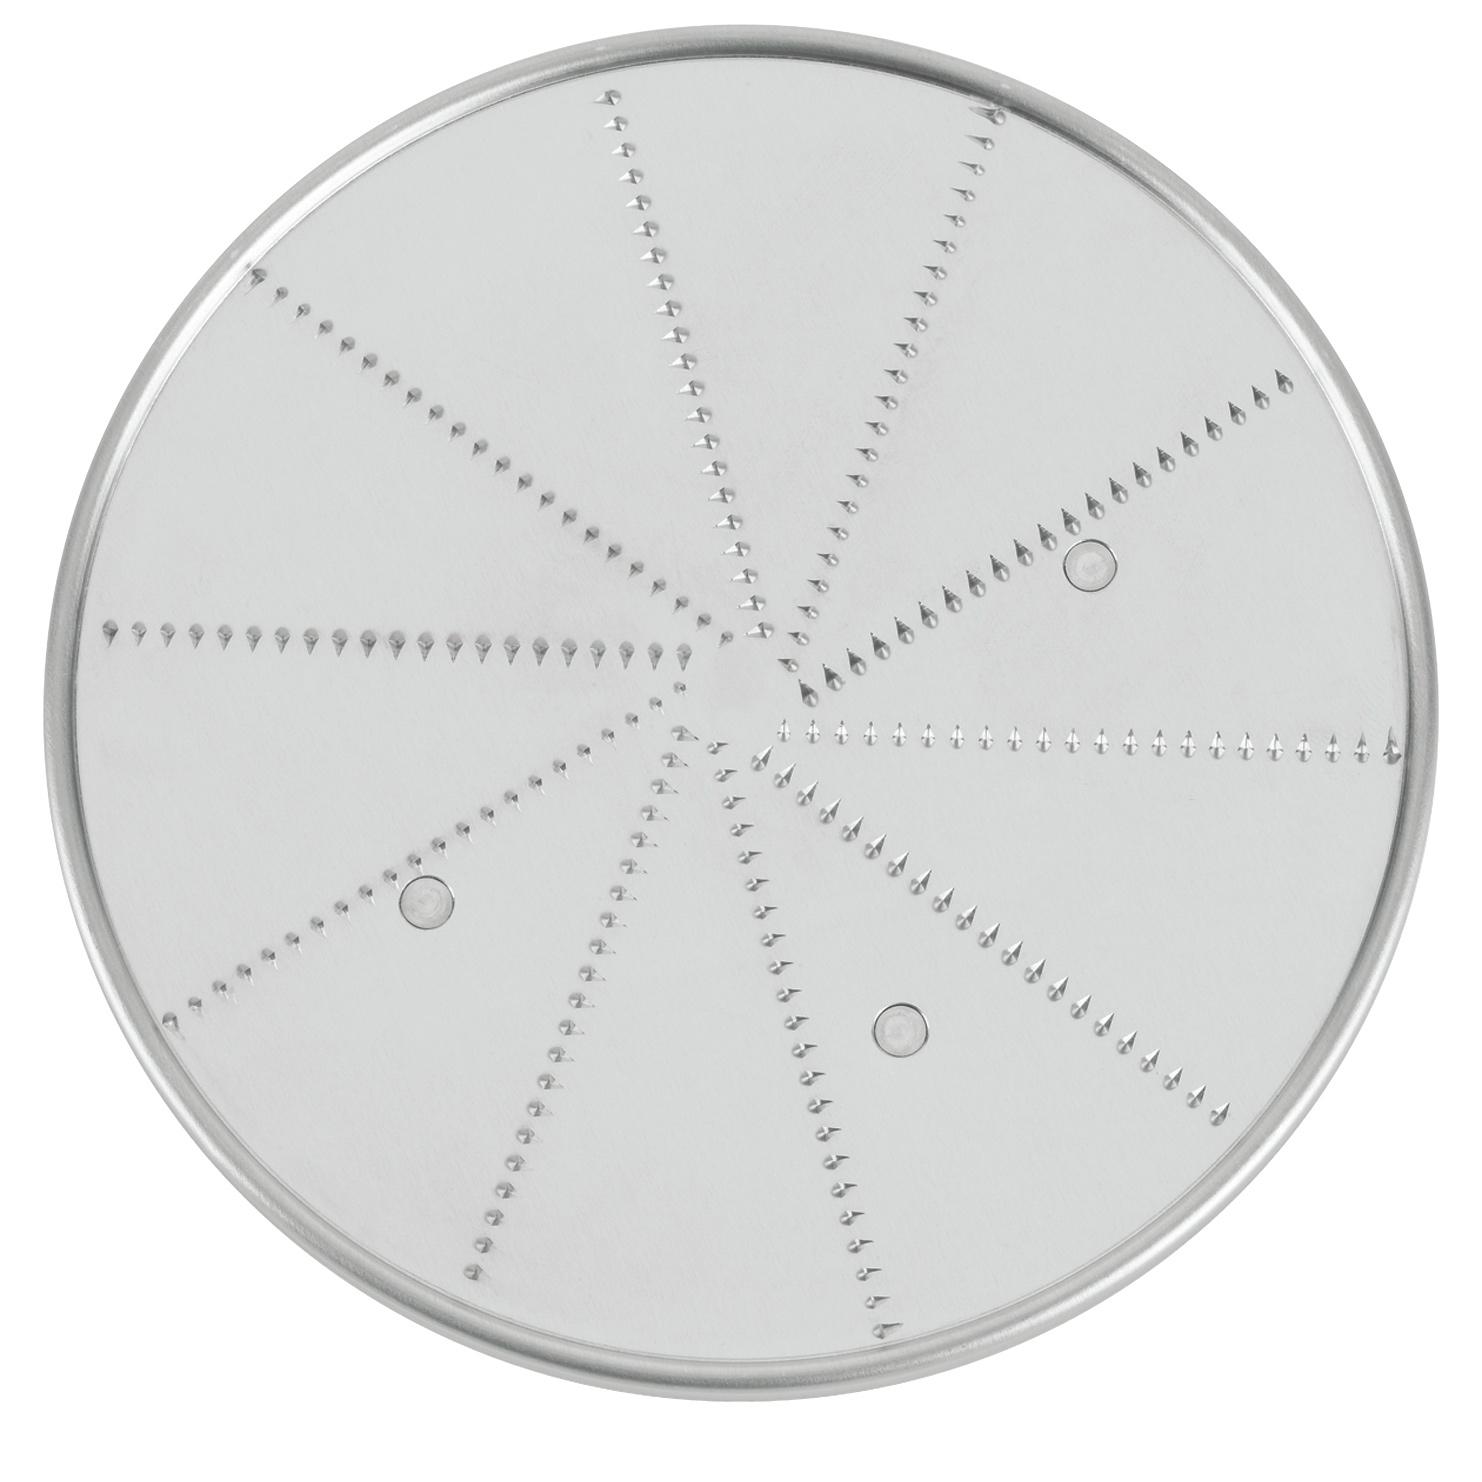 Waring WFP113 food processor, disc plate, shredding / grating